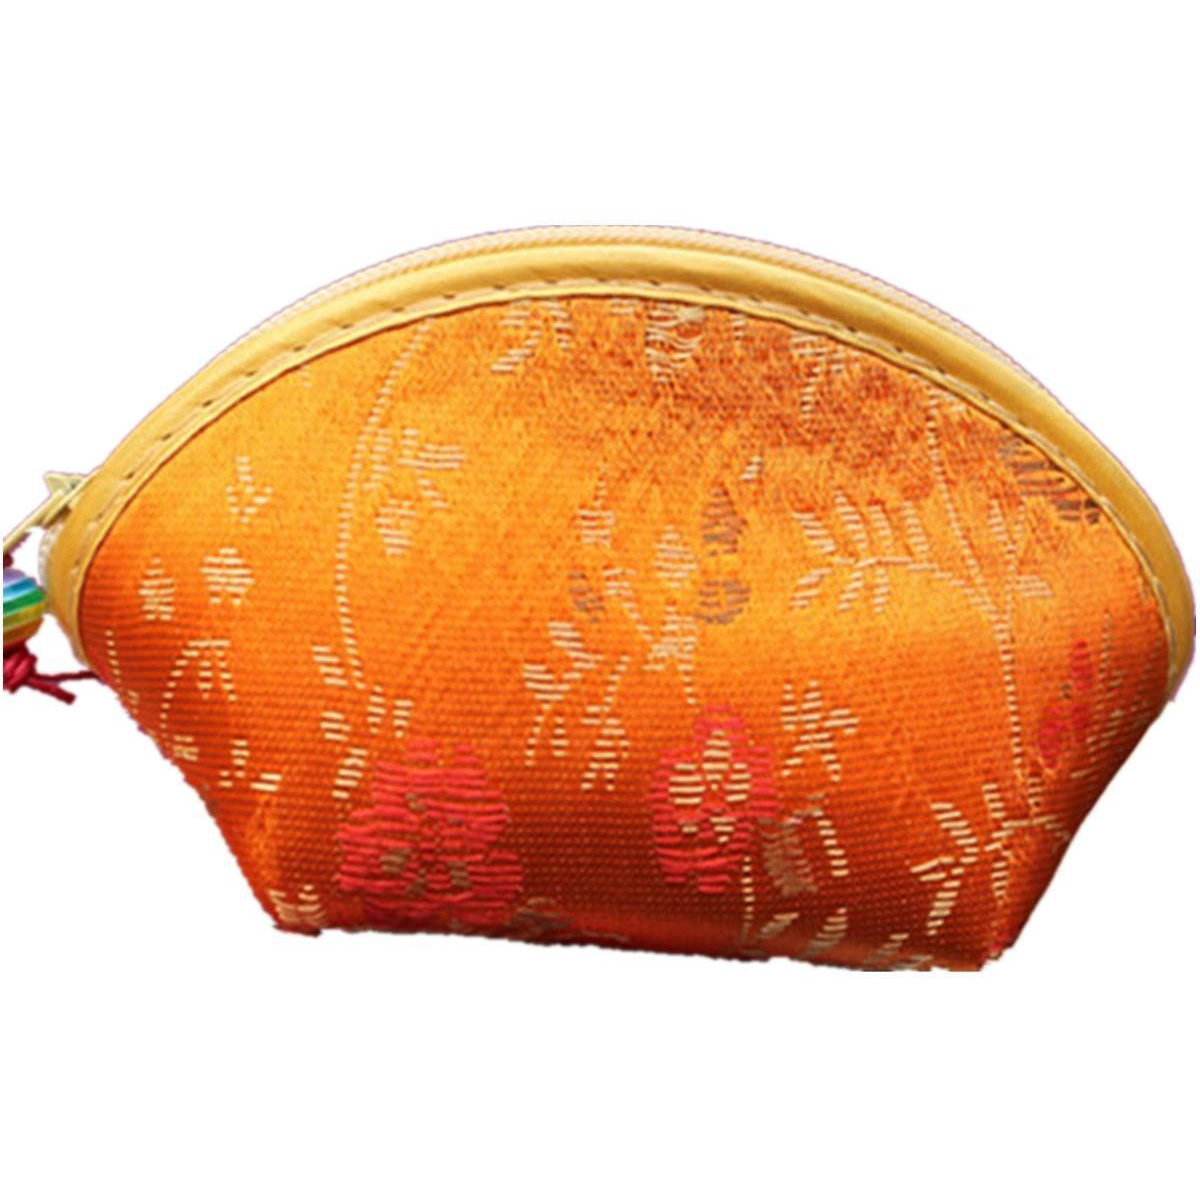 FGGS Hot Chinese Silk Embroidery Wallet Change Coin Bag Handbag Small Purse Pouch Random fggs hot chinese silk embroidery wallet change coin bag handbag small purse pouch random